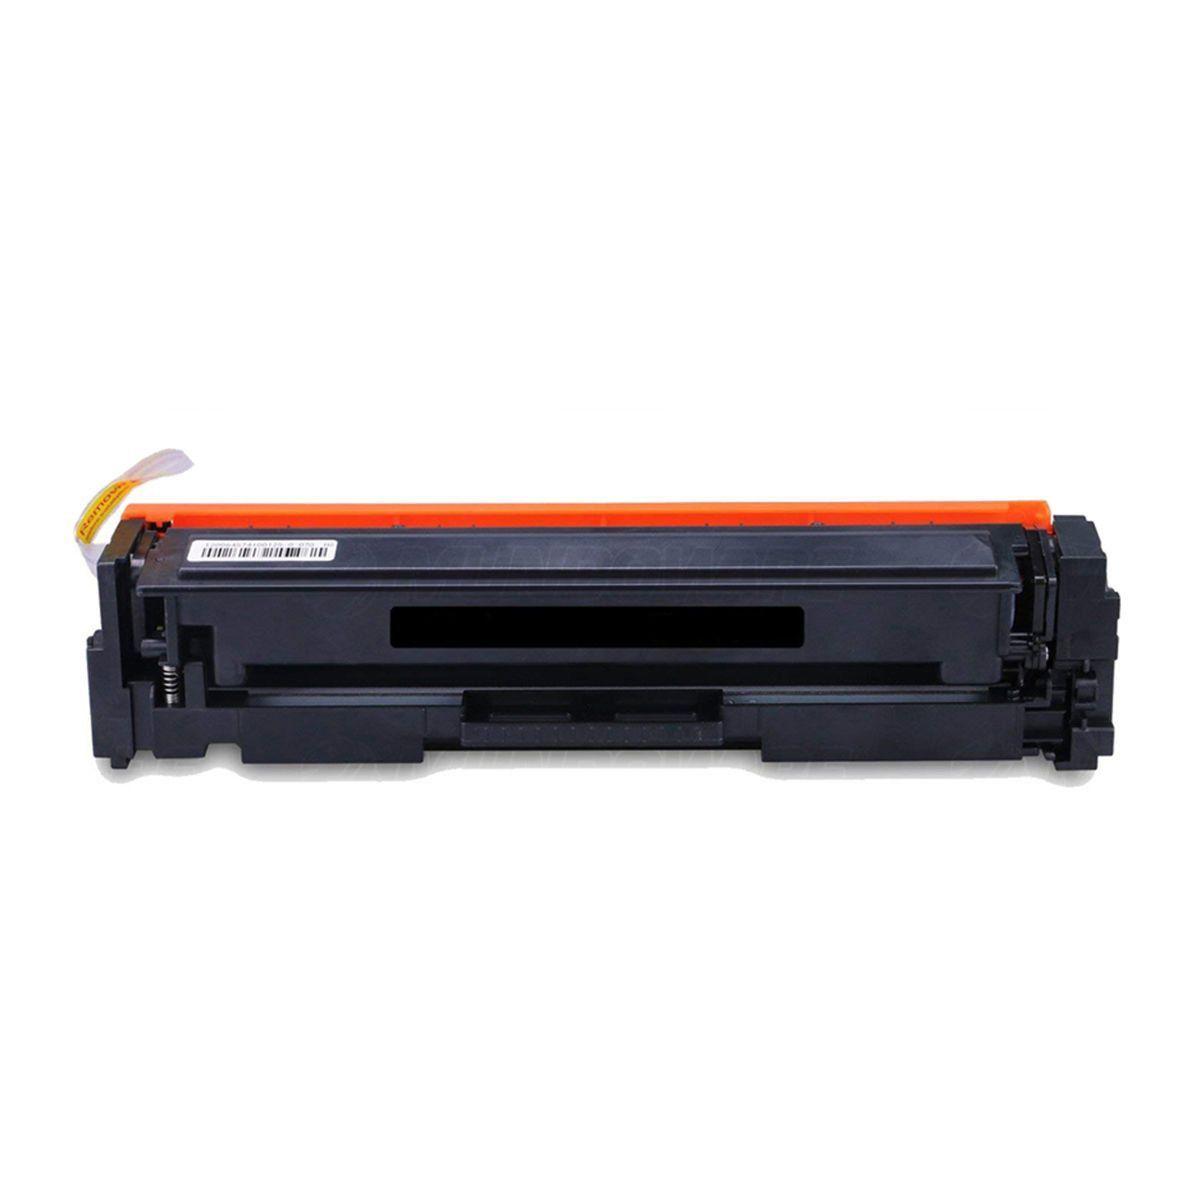 Compatível: Toner CF500A 500A 202A para impressora HP M281nw M281fdn M281fdw M280nw M254dn M254dw M254nw / Preto / 1.400